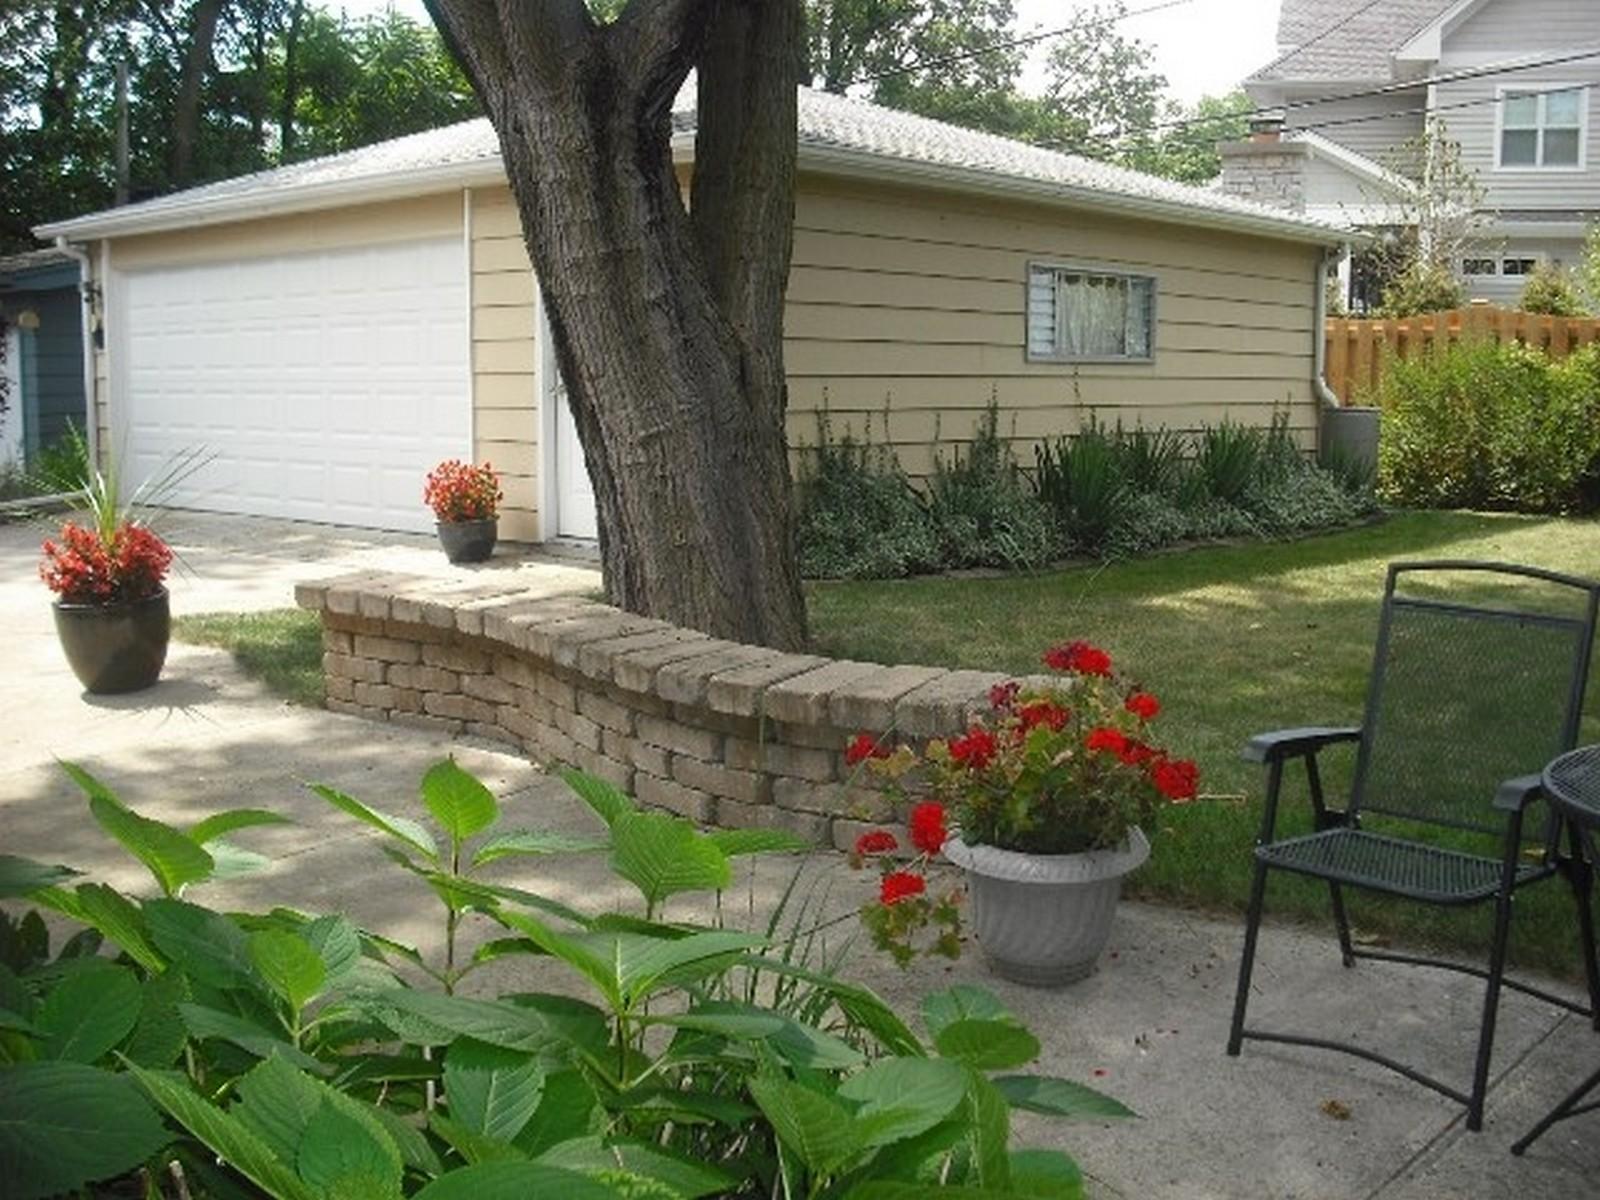 Real Estate Photography - 368 Lorraine St, Glen Ellyn, IL, 60137 - Patio/Back Yard